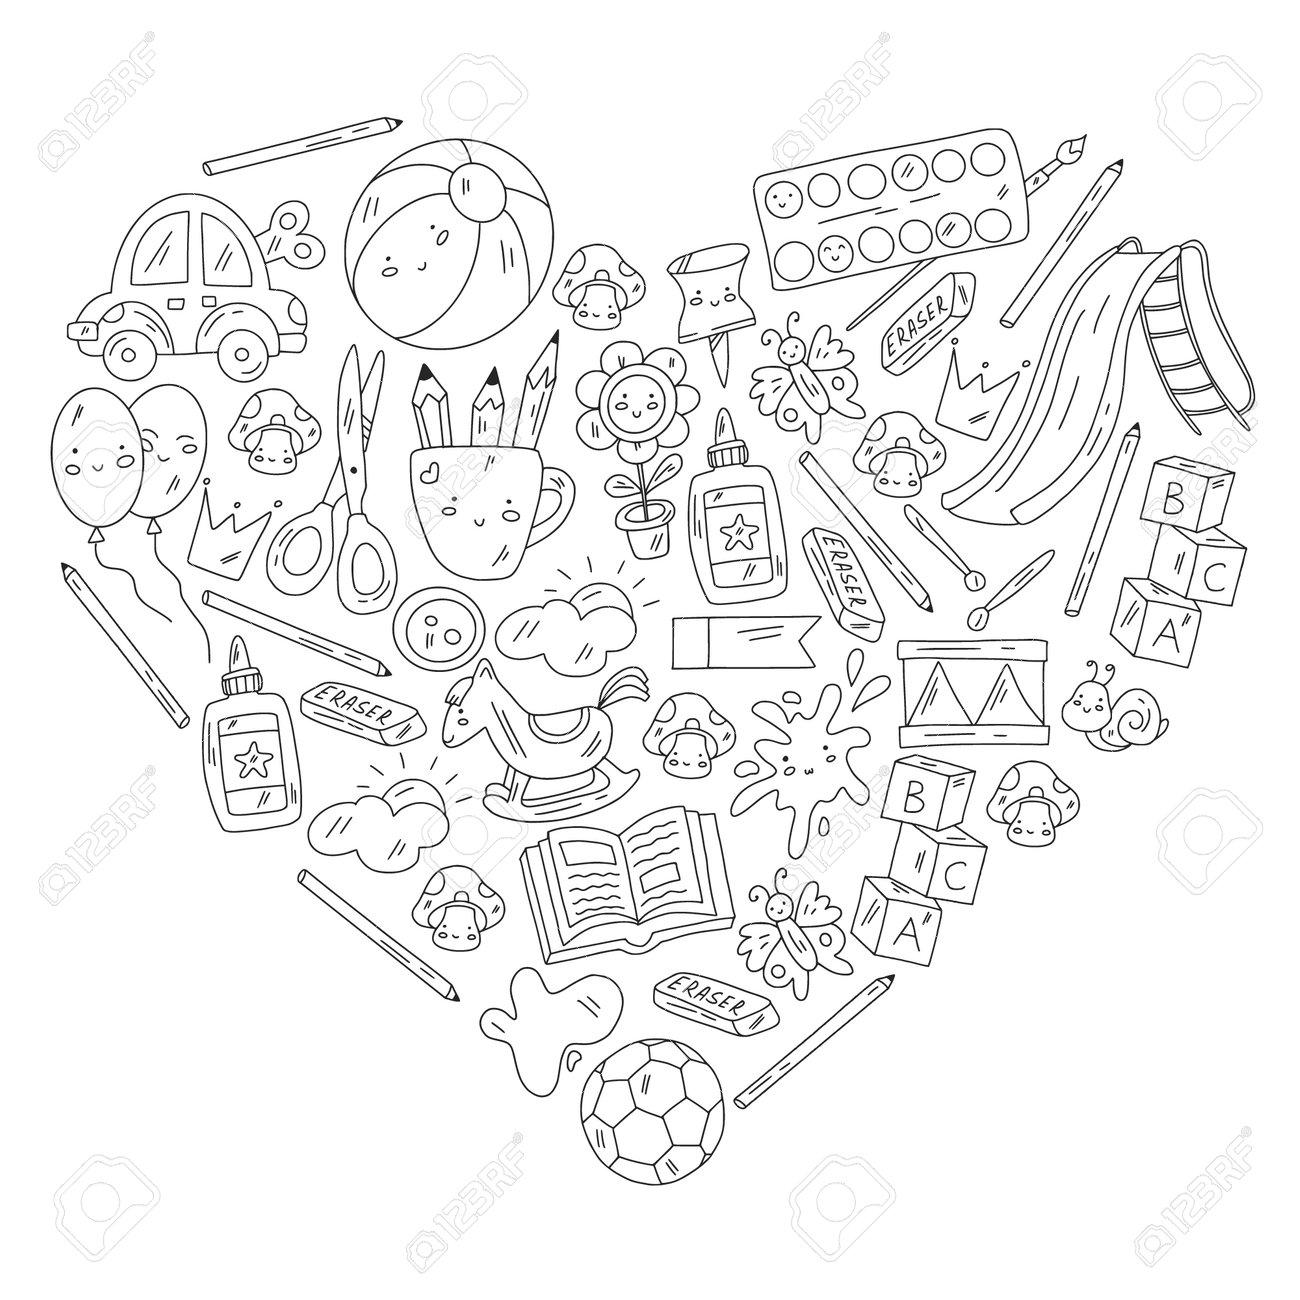 Children play with toys in the kindergarten. Kids playground. Education, creativity, imagination. - 173369877